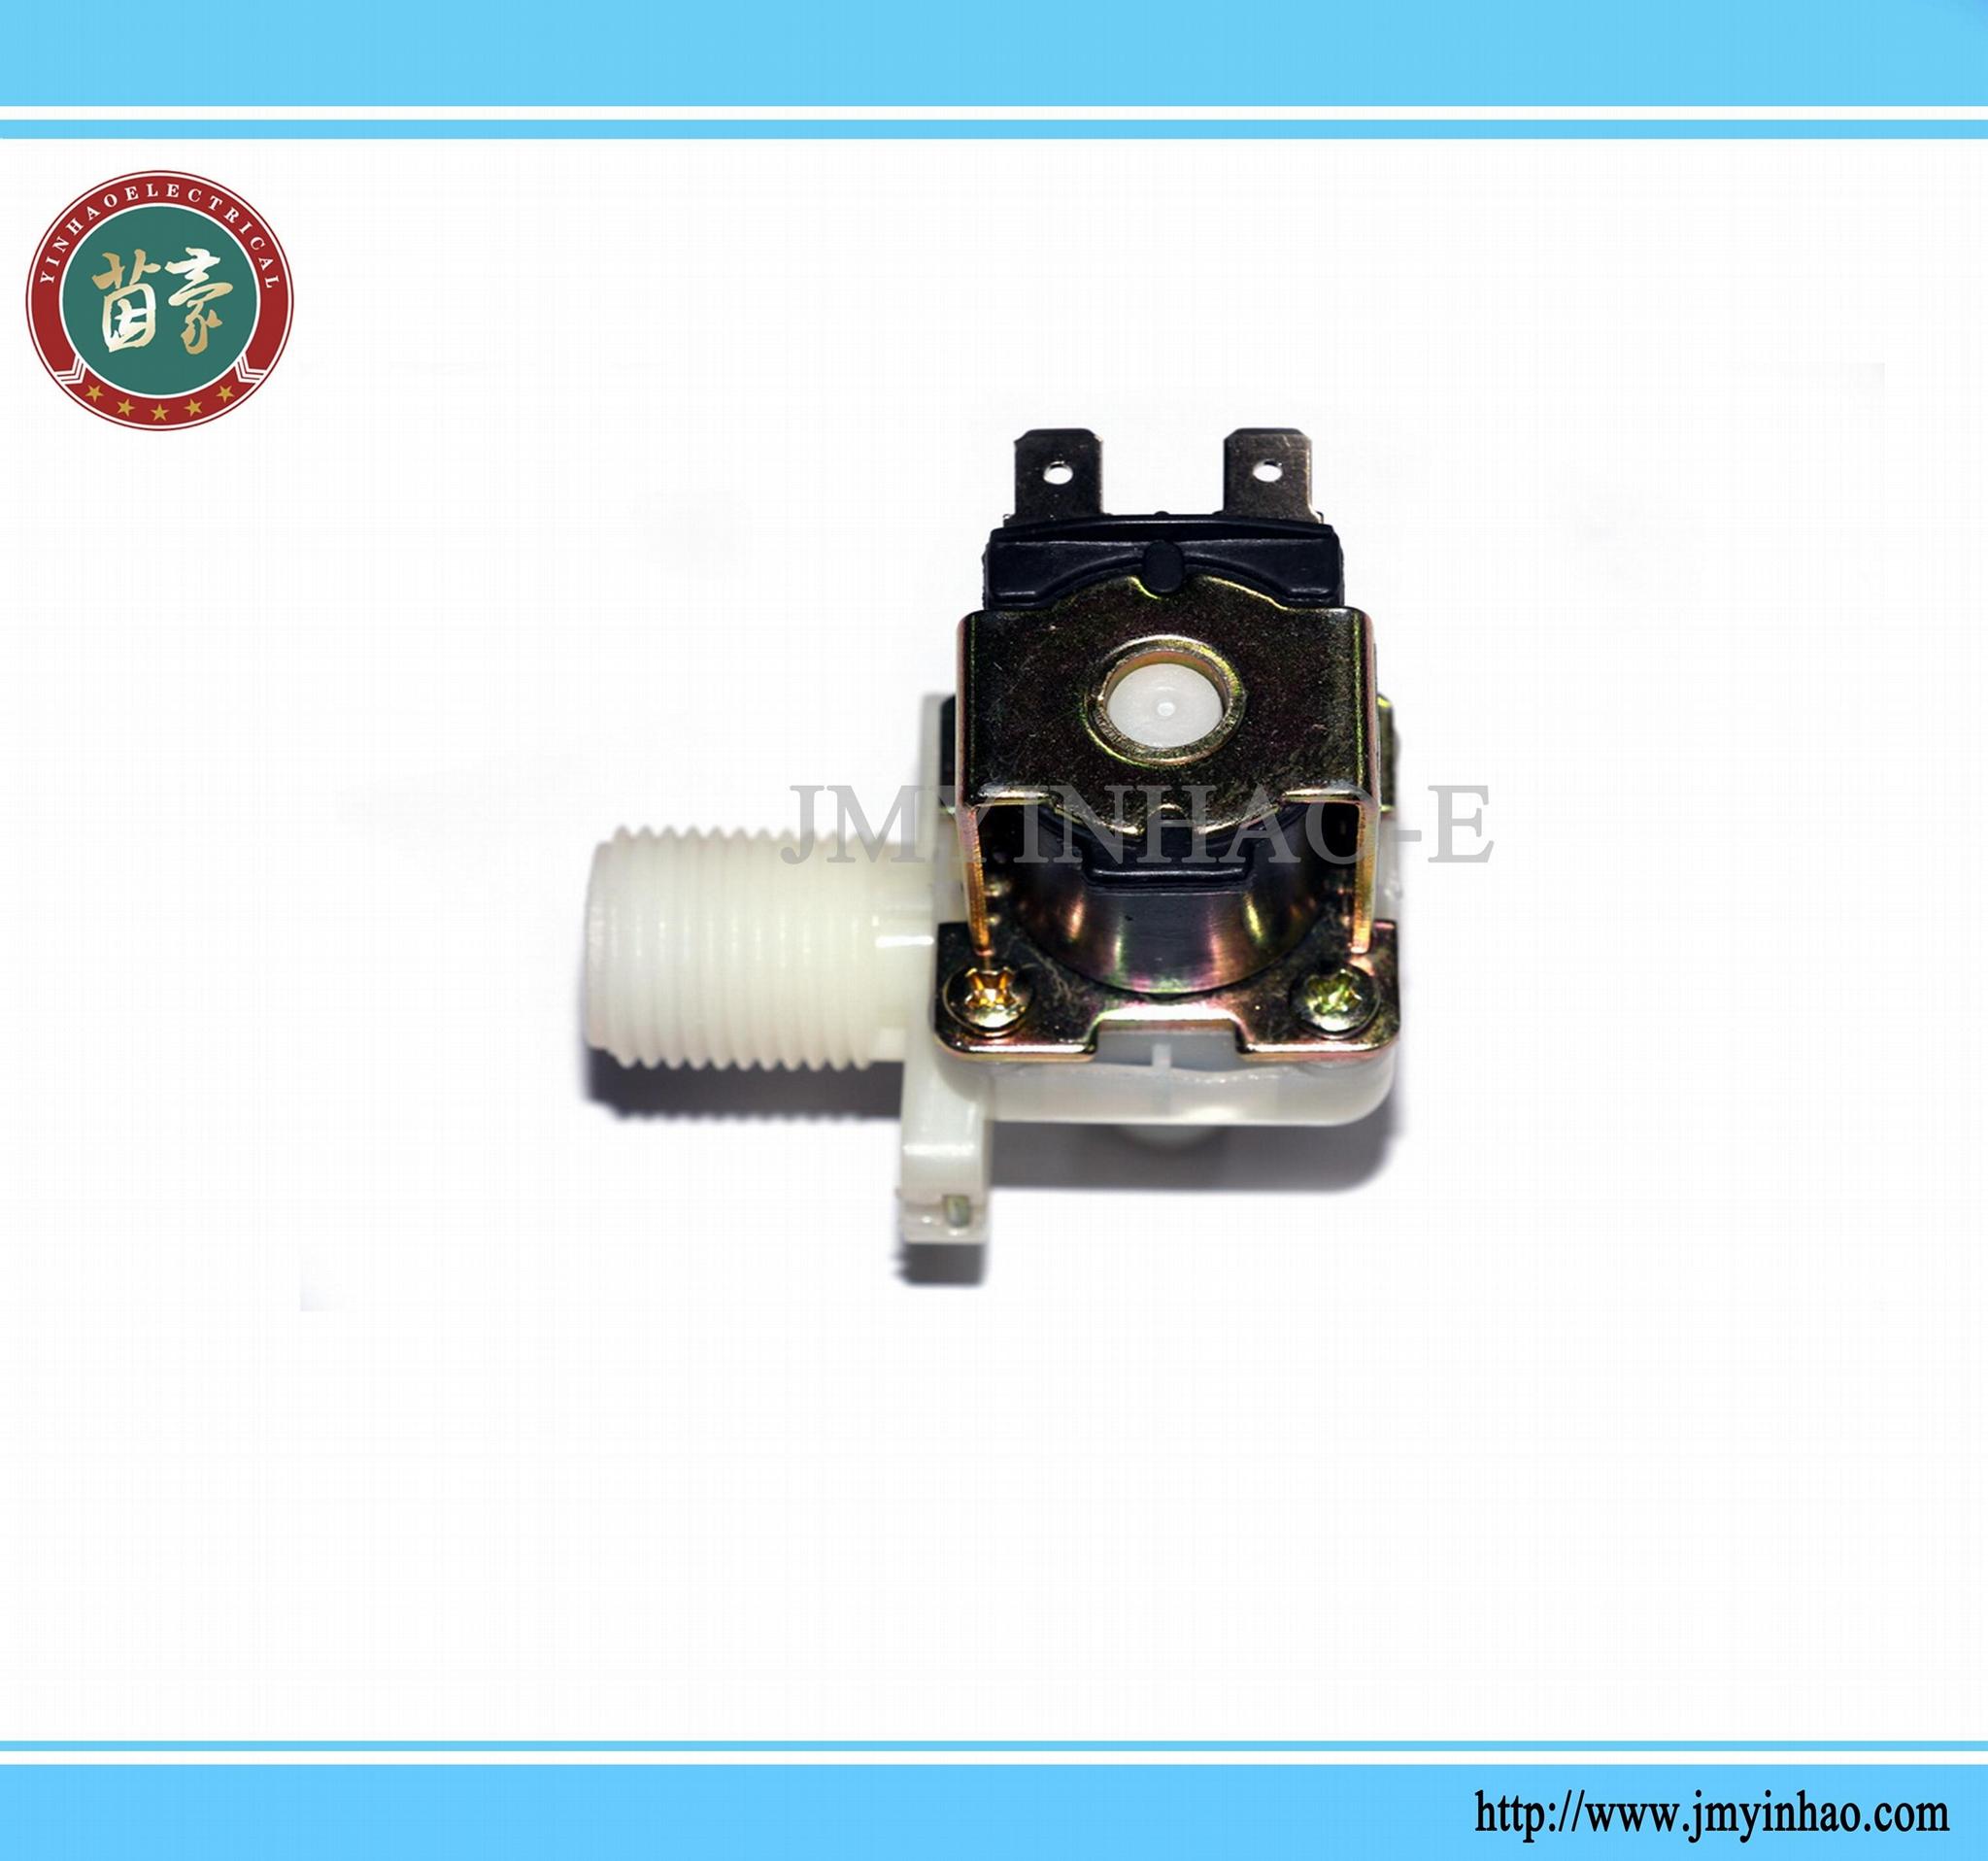 washing machine water inlet va  e/solenoid control va  e 3